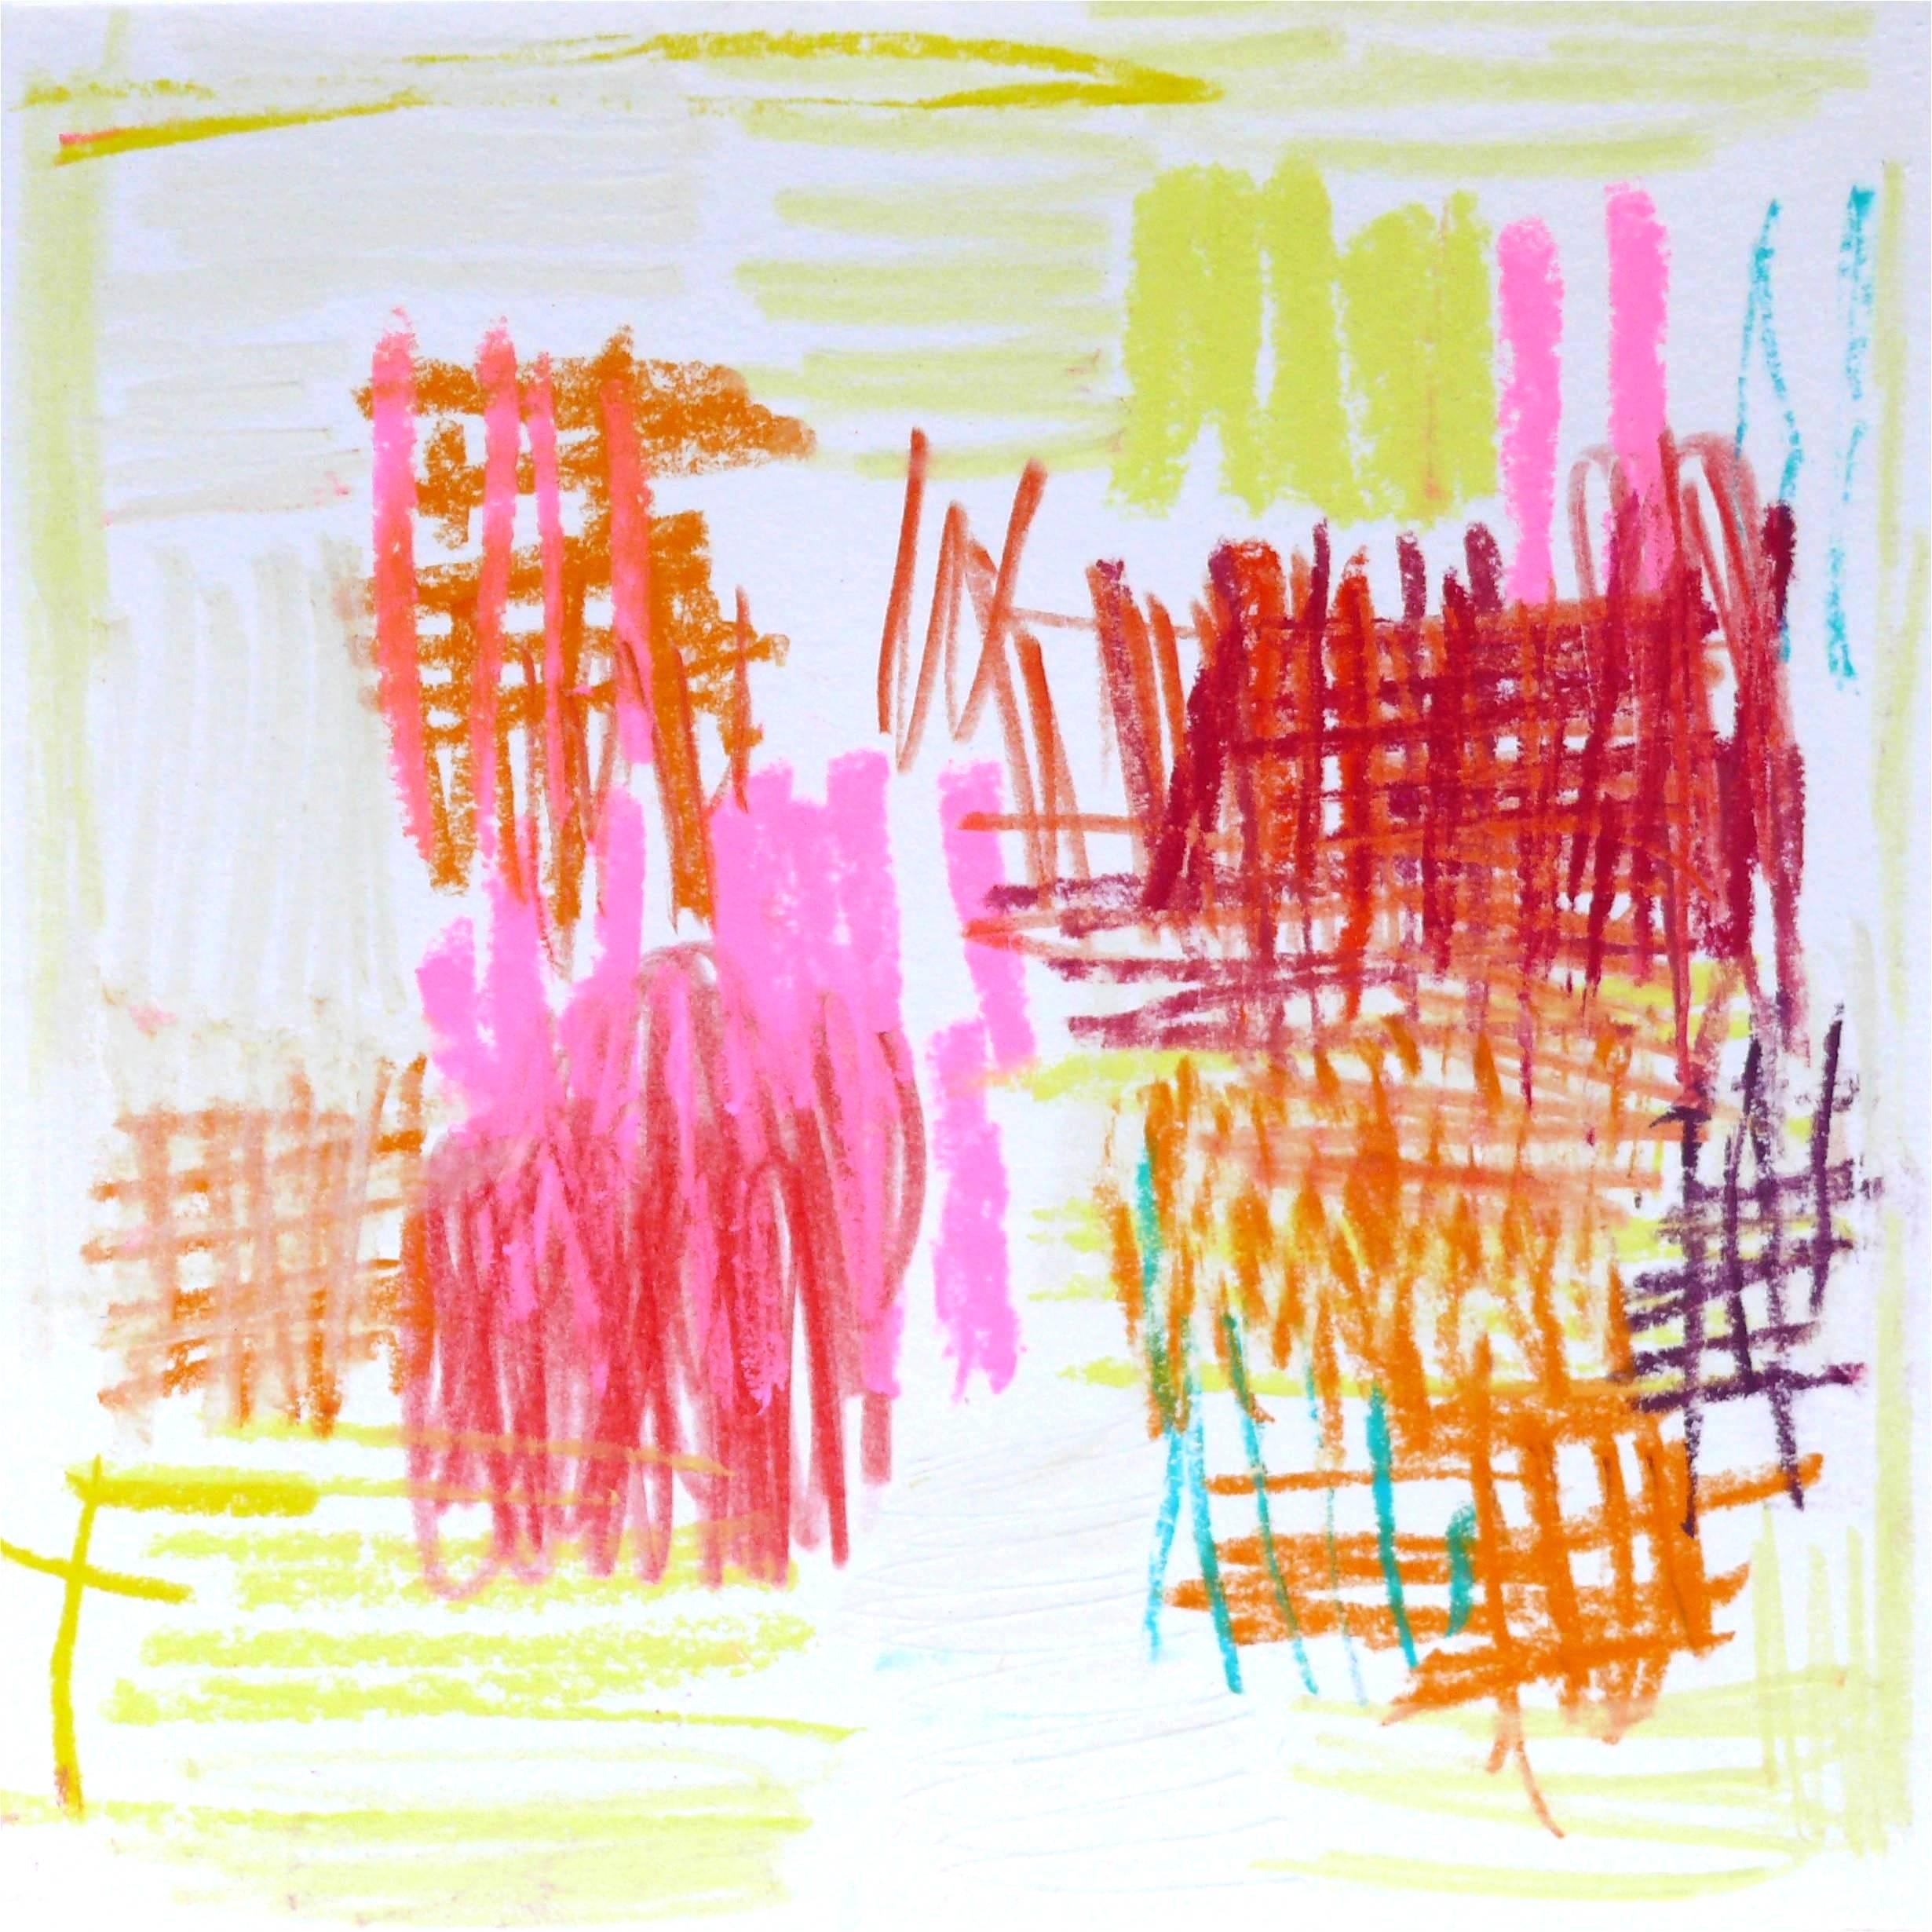 13_Pastellkreide auf Karton 15x15 cm